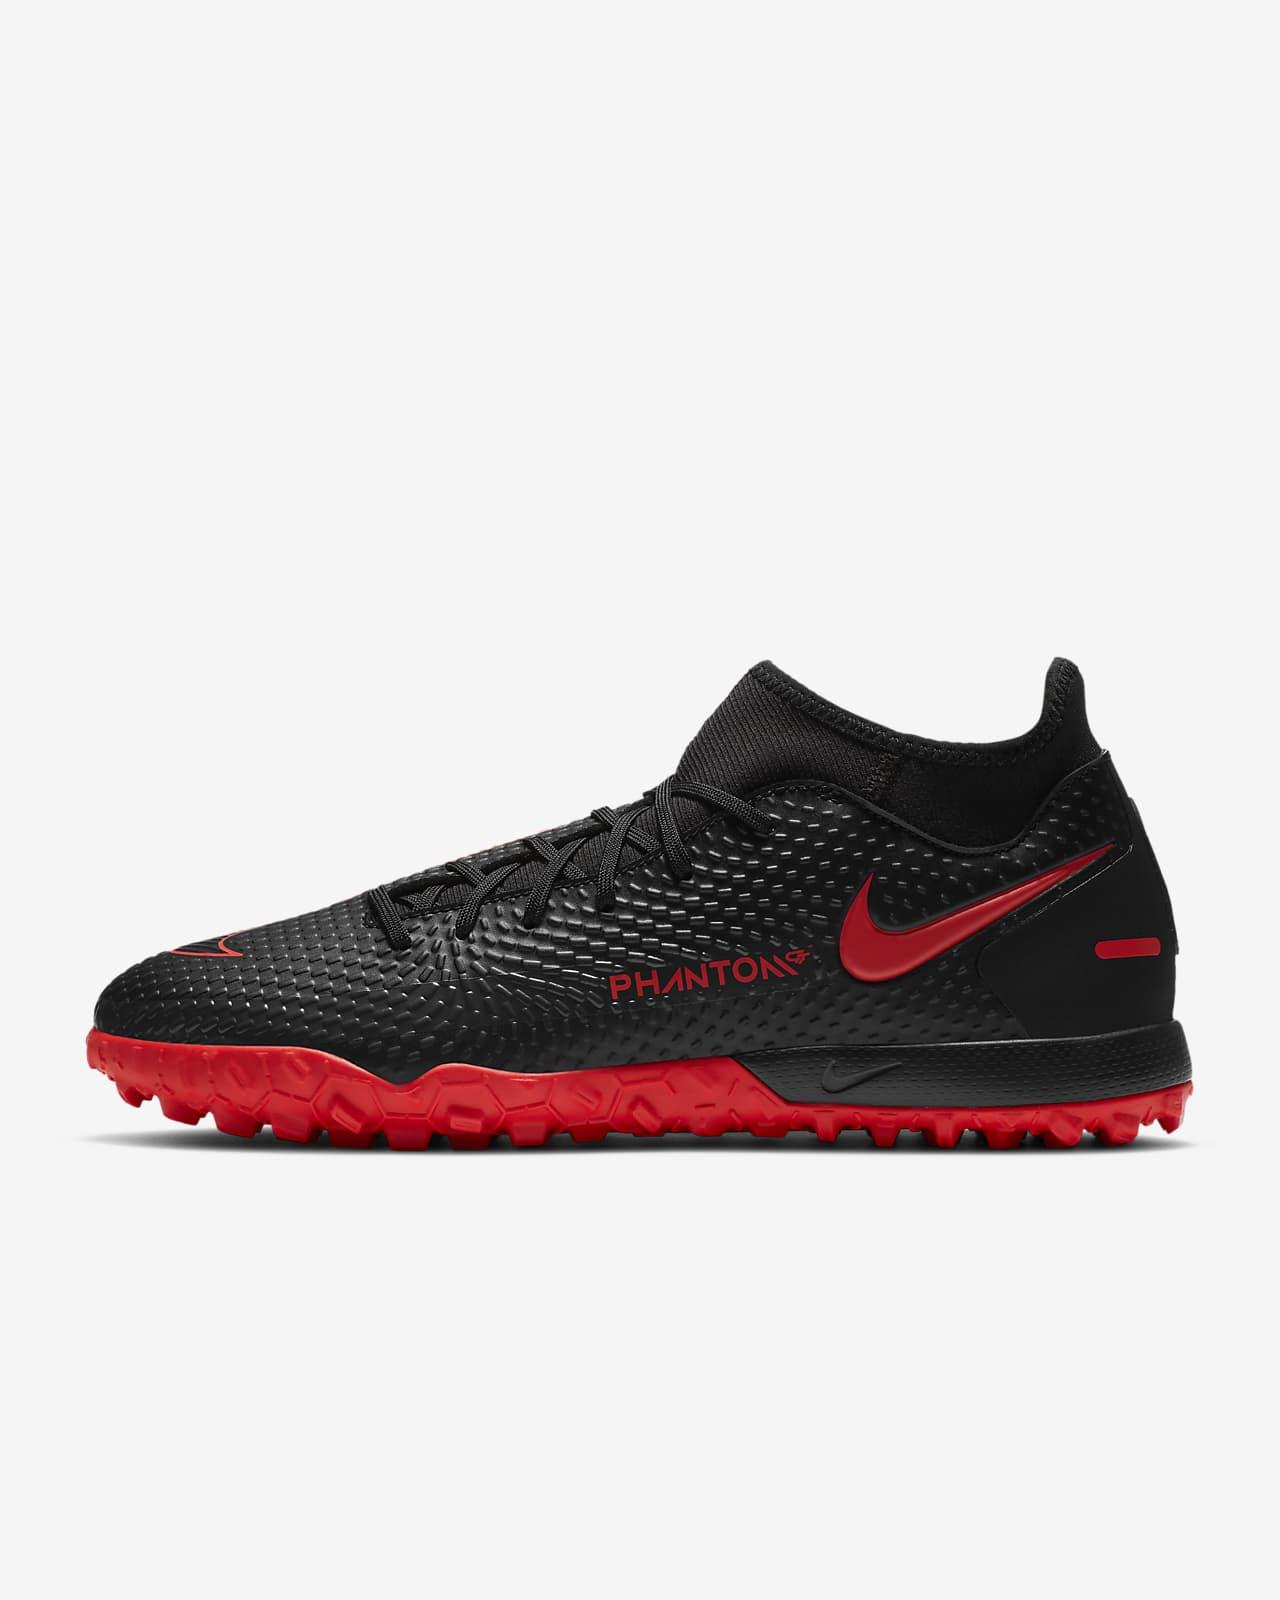 Nike Phantom GT Academy Dynamic Fit TF Artificial-Turf Football Shoe